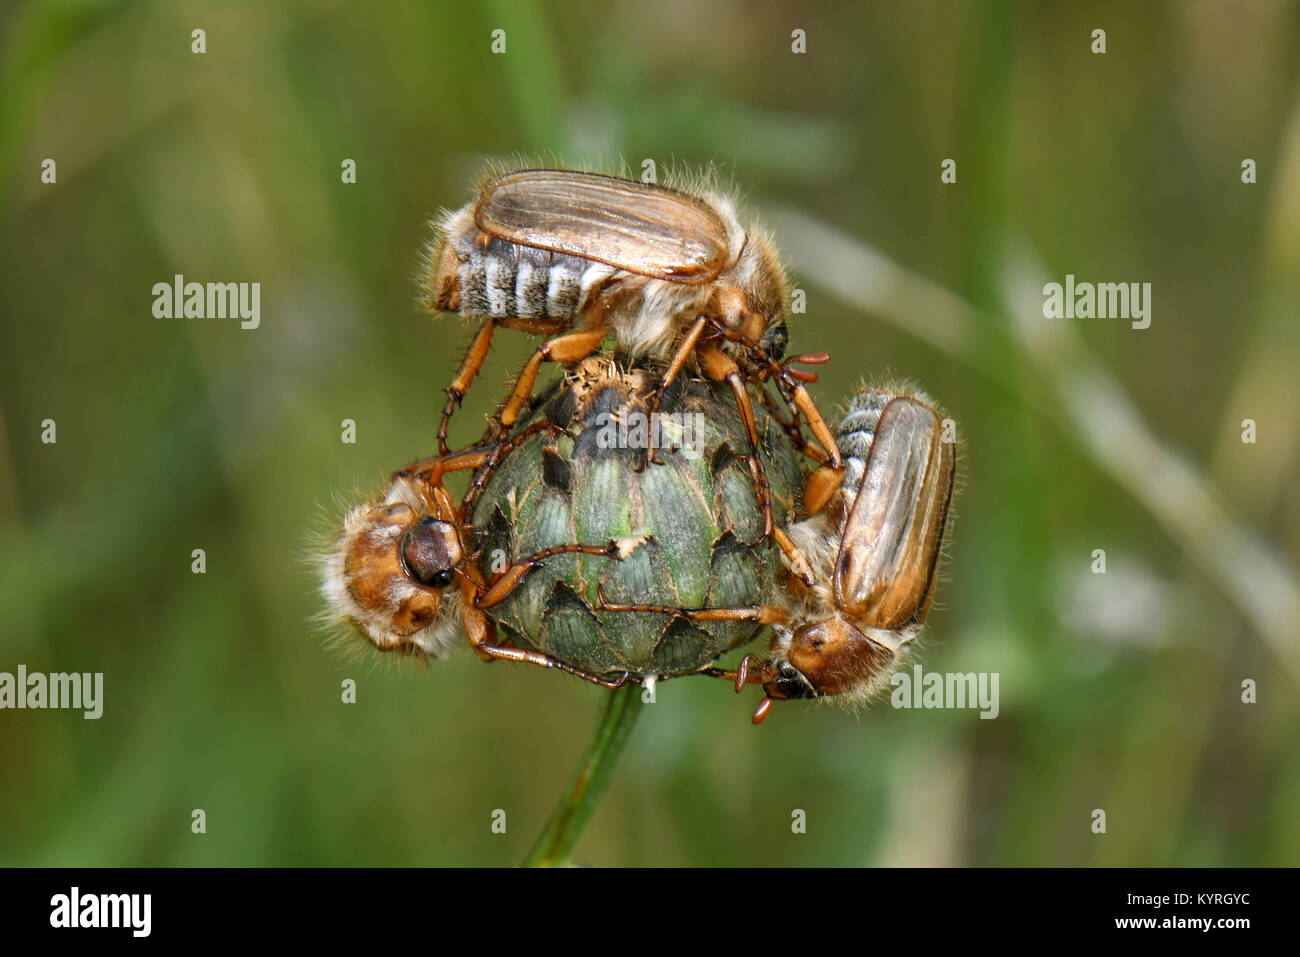 Summer Chafer, European June Beetle (Amphimallon solstitiale) three Imagos on  the flowerbud of a Knapweed ( Centaurea - Stock Image